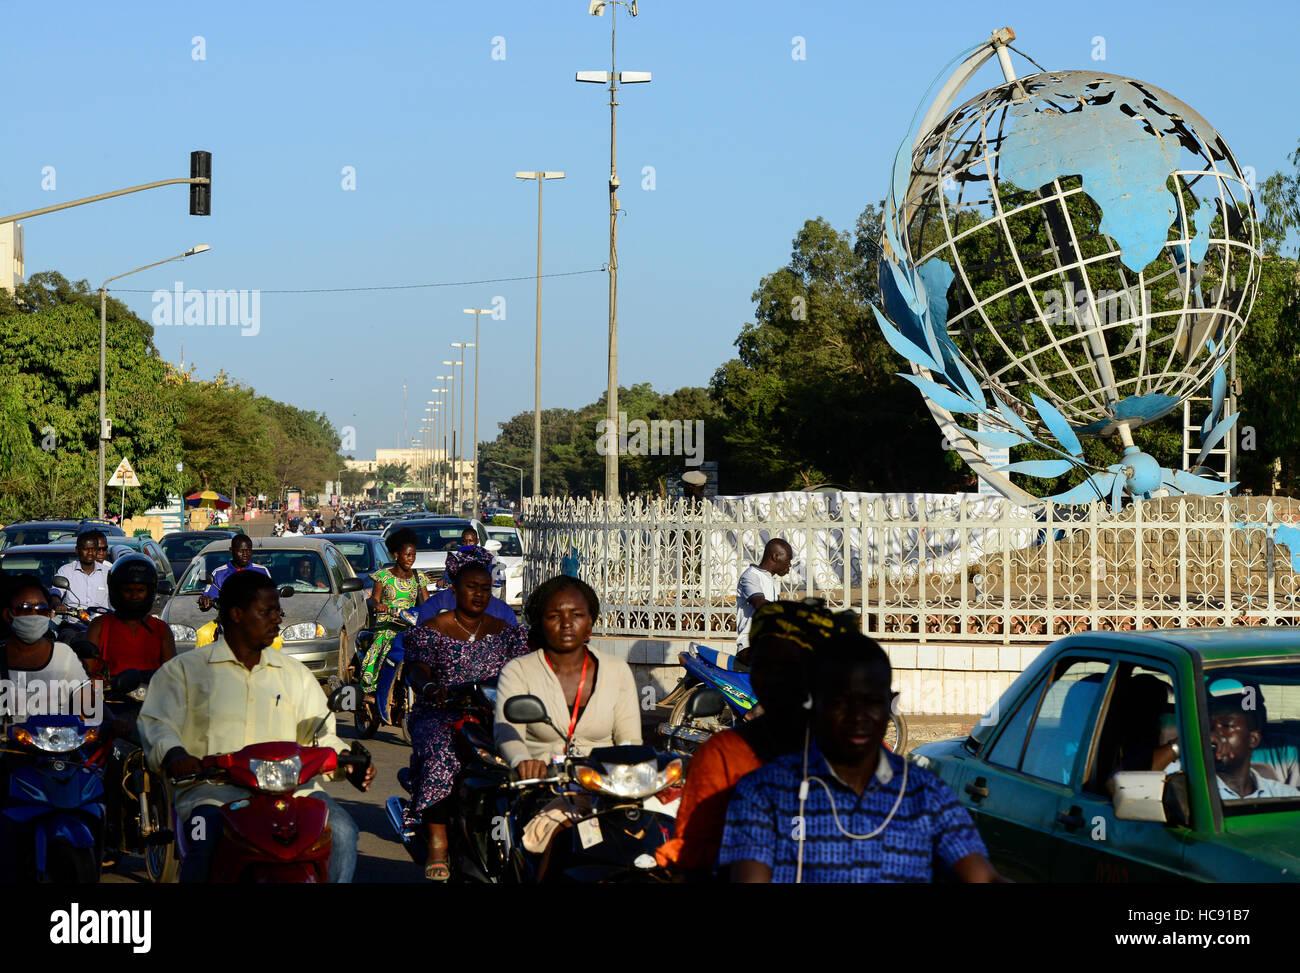 BURKINA FASO, Hauptstadt Ouagadougou, Verkehr, Kreisverkehr mit der ganzen Welt das Symbol des UN / Kreisverkehr Stockbild